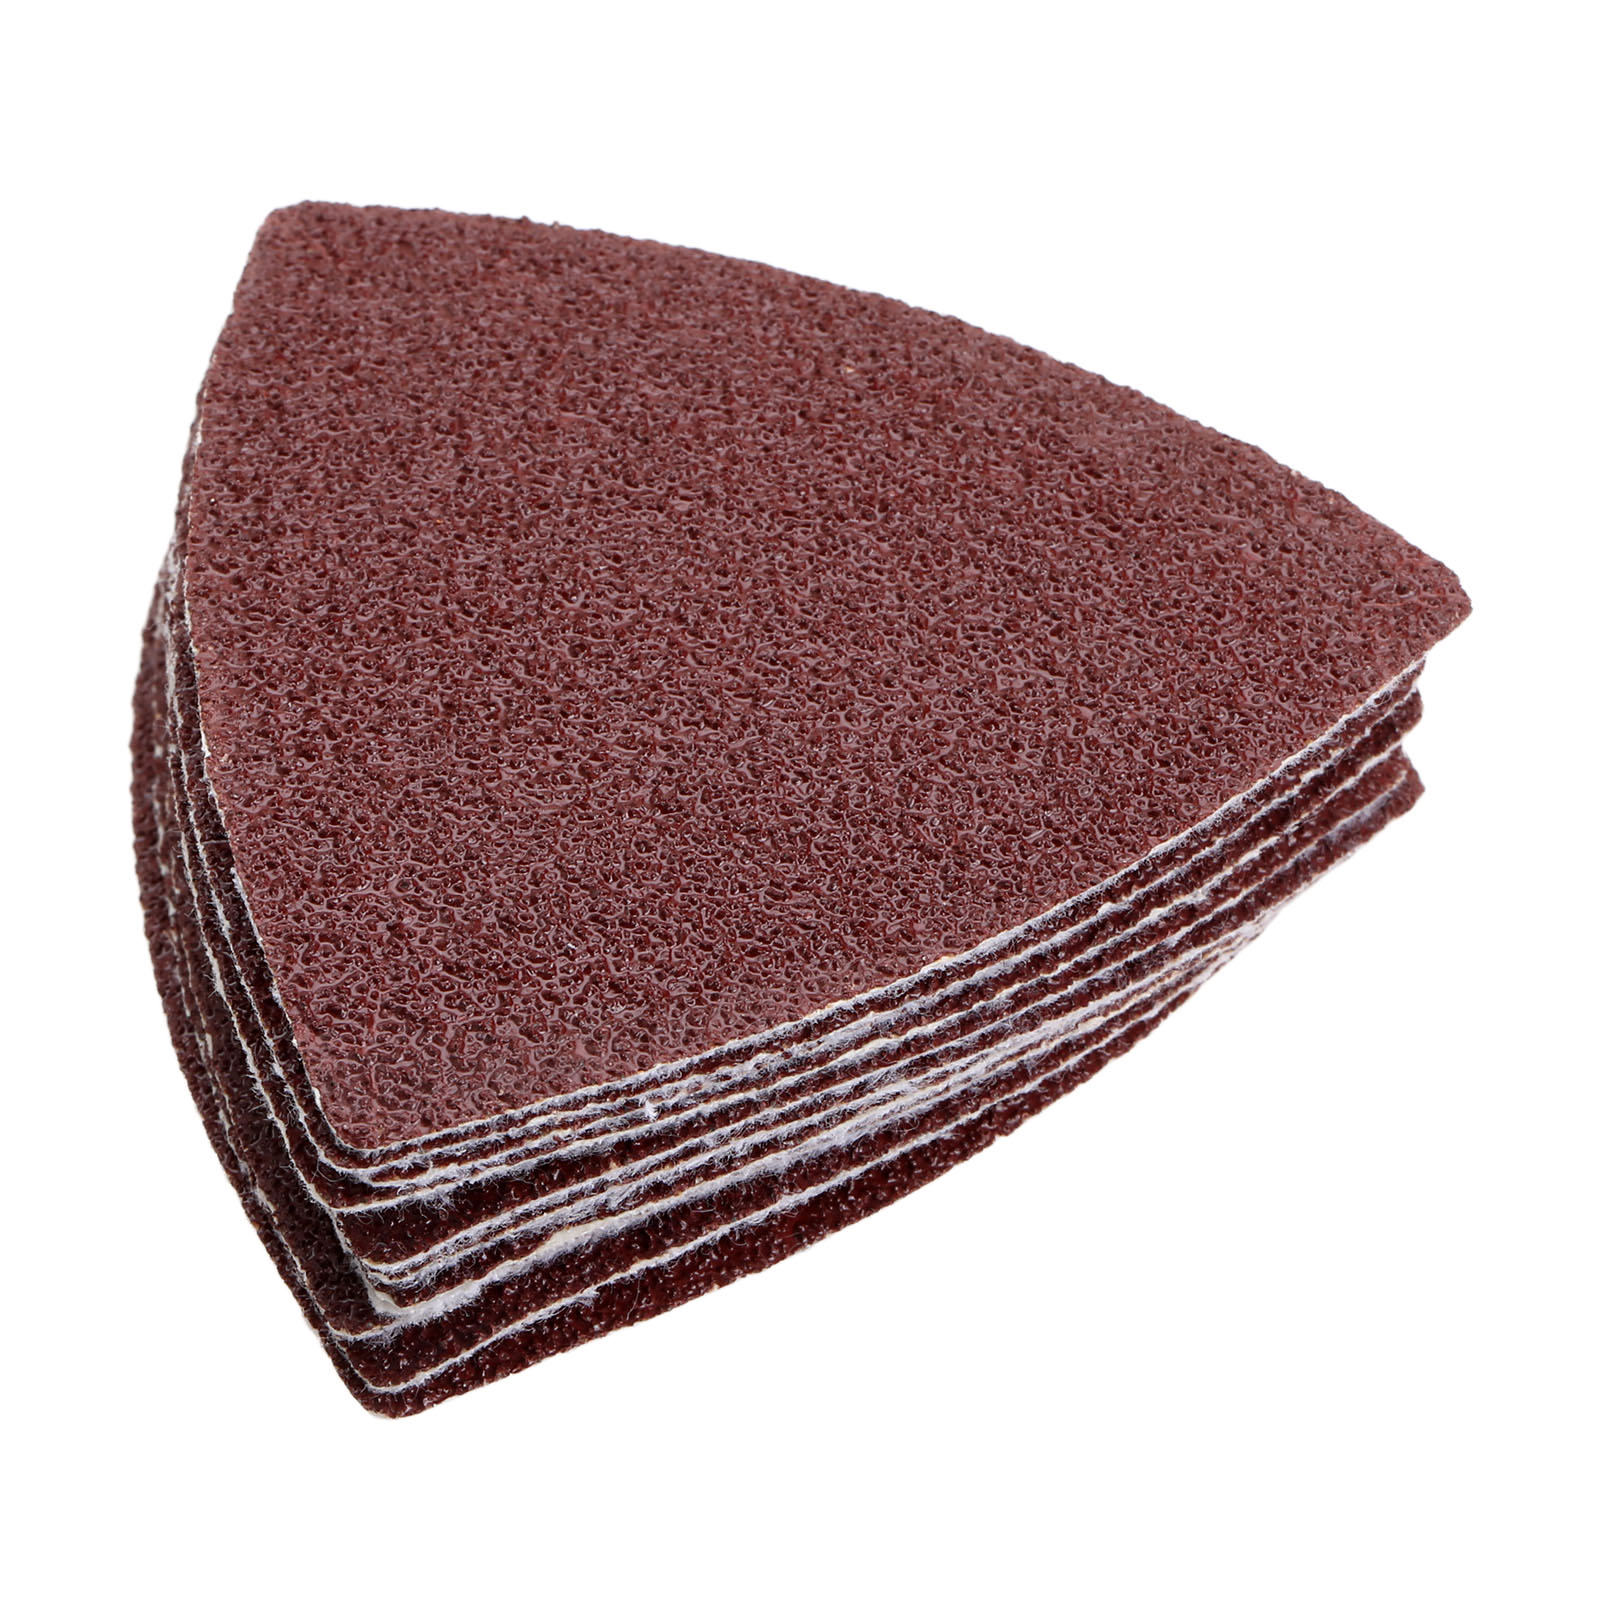 10Pcs Dremel Accessories 80mm Sand Paper Abrasive Sandpaper Wood Grinding Polishing Sanding Tool Grit 40/60/80/120/180/240